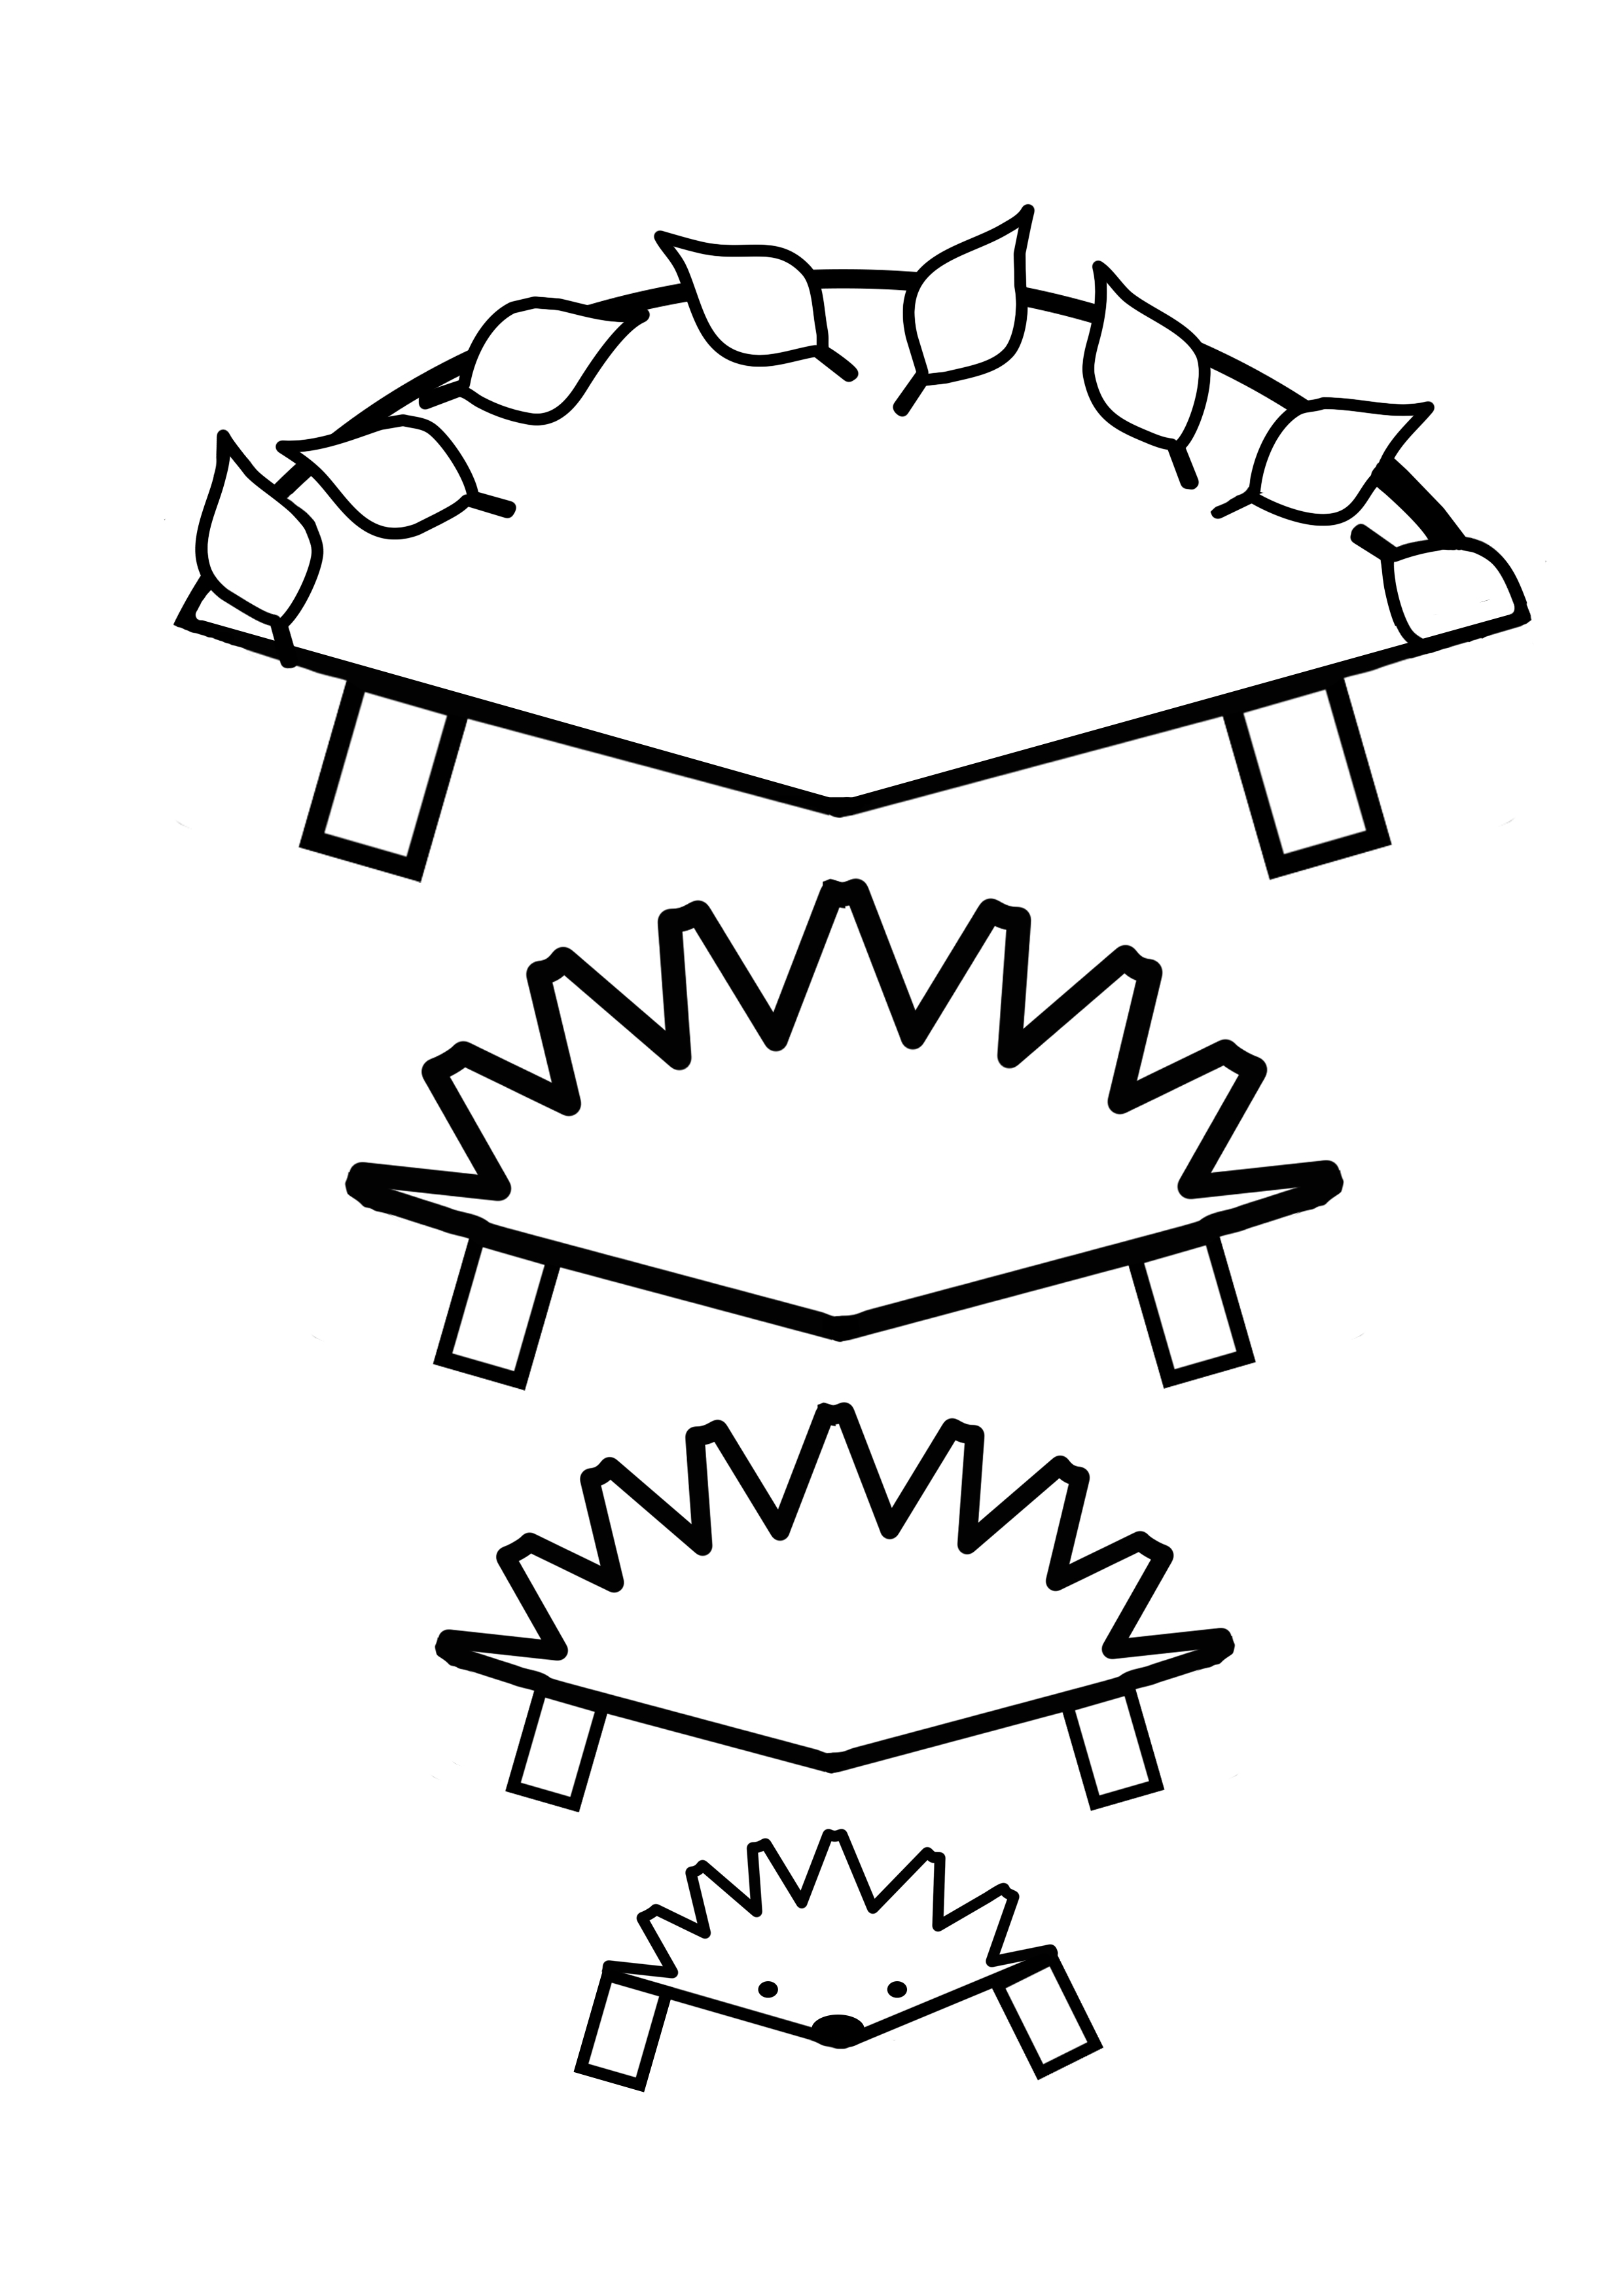 Hedgehog in a Leaf Pile template